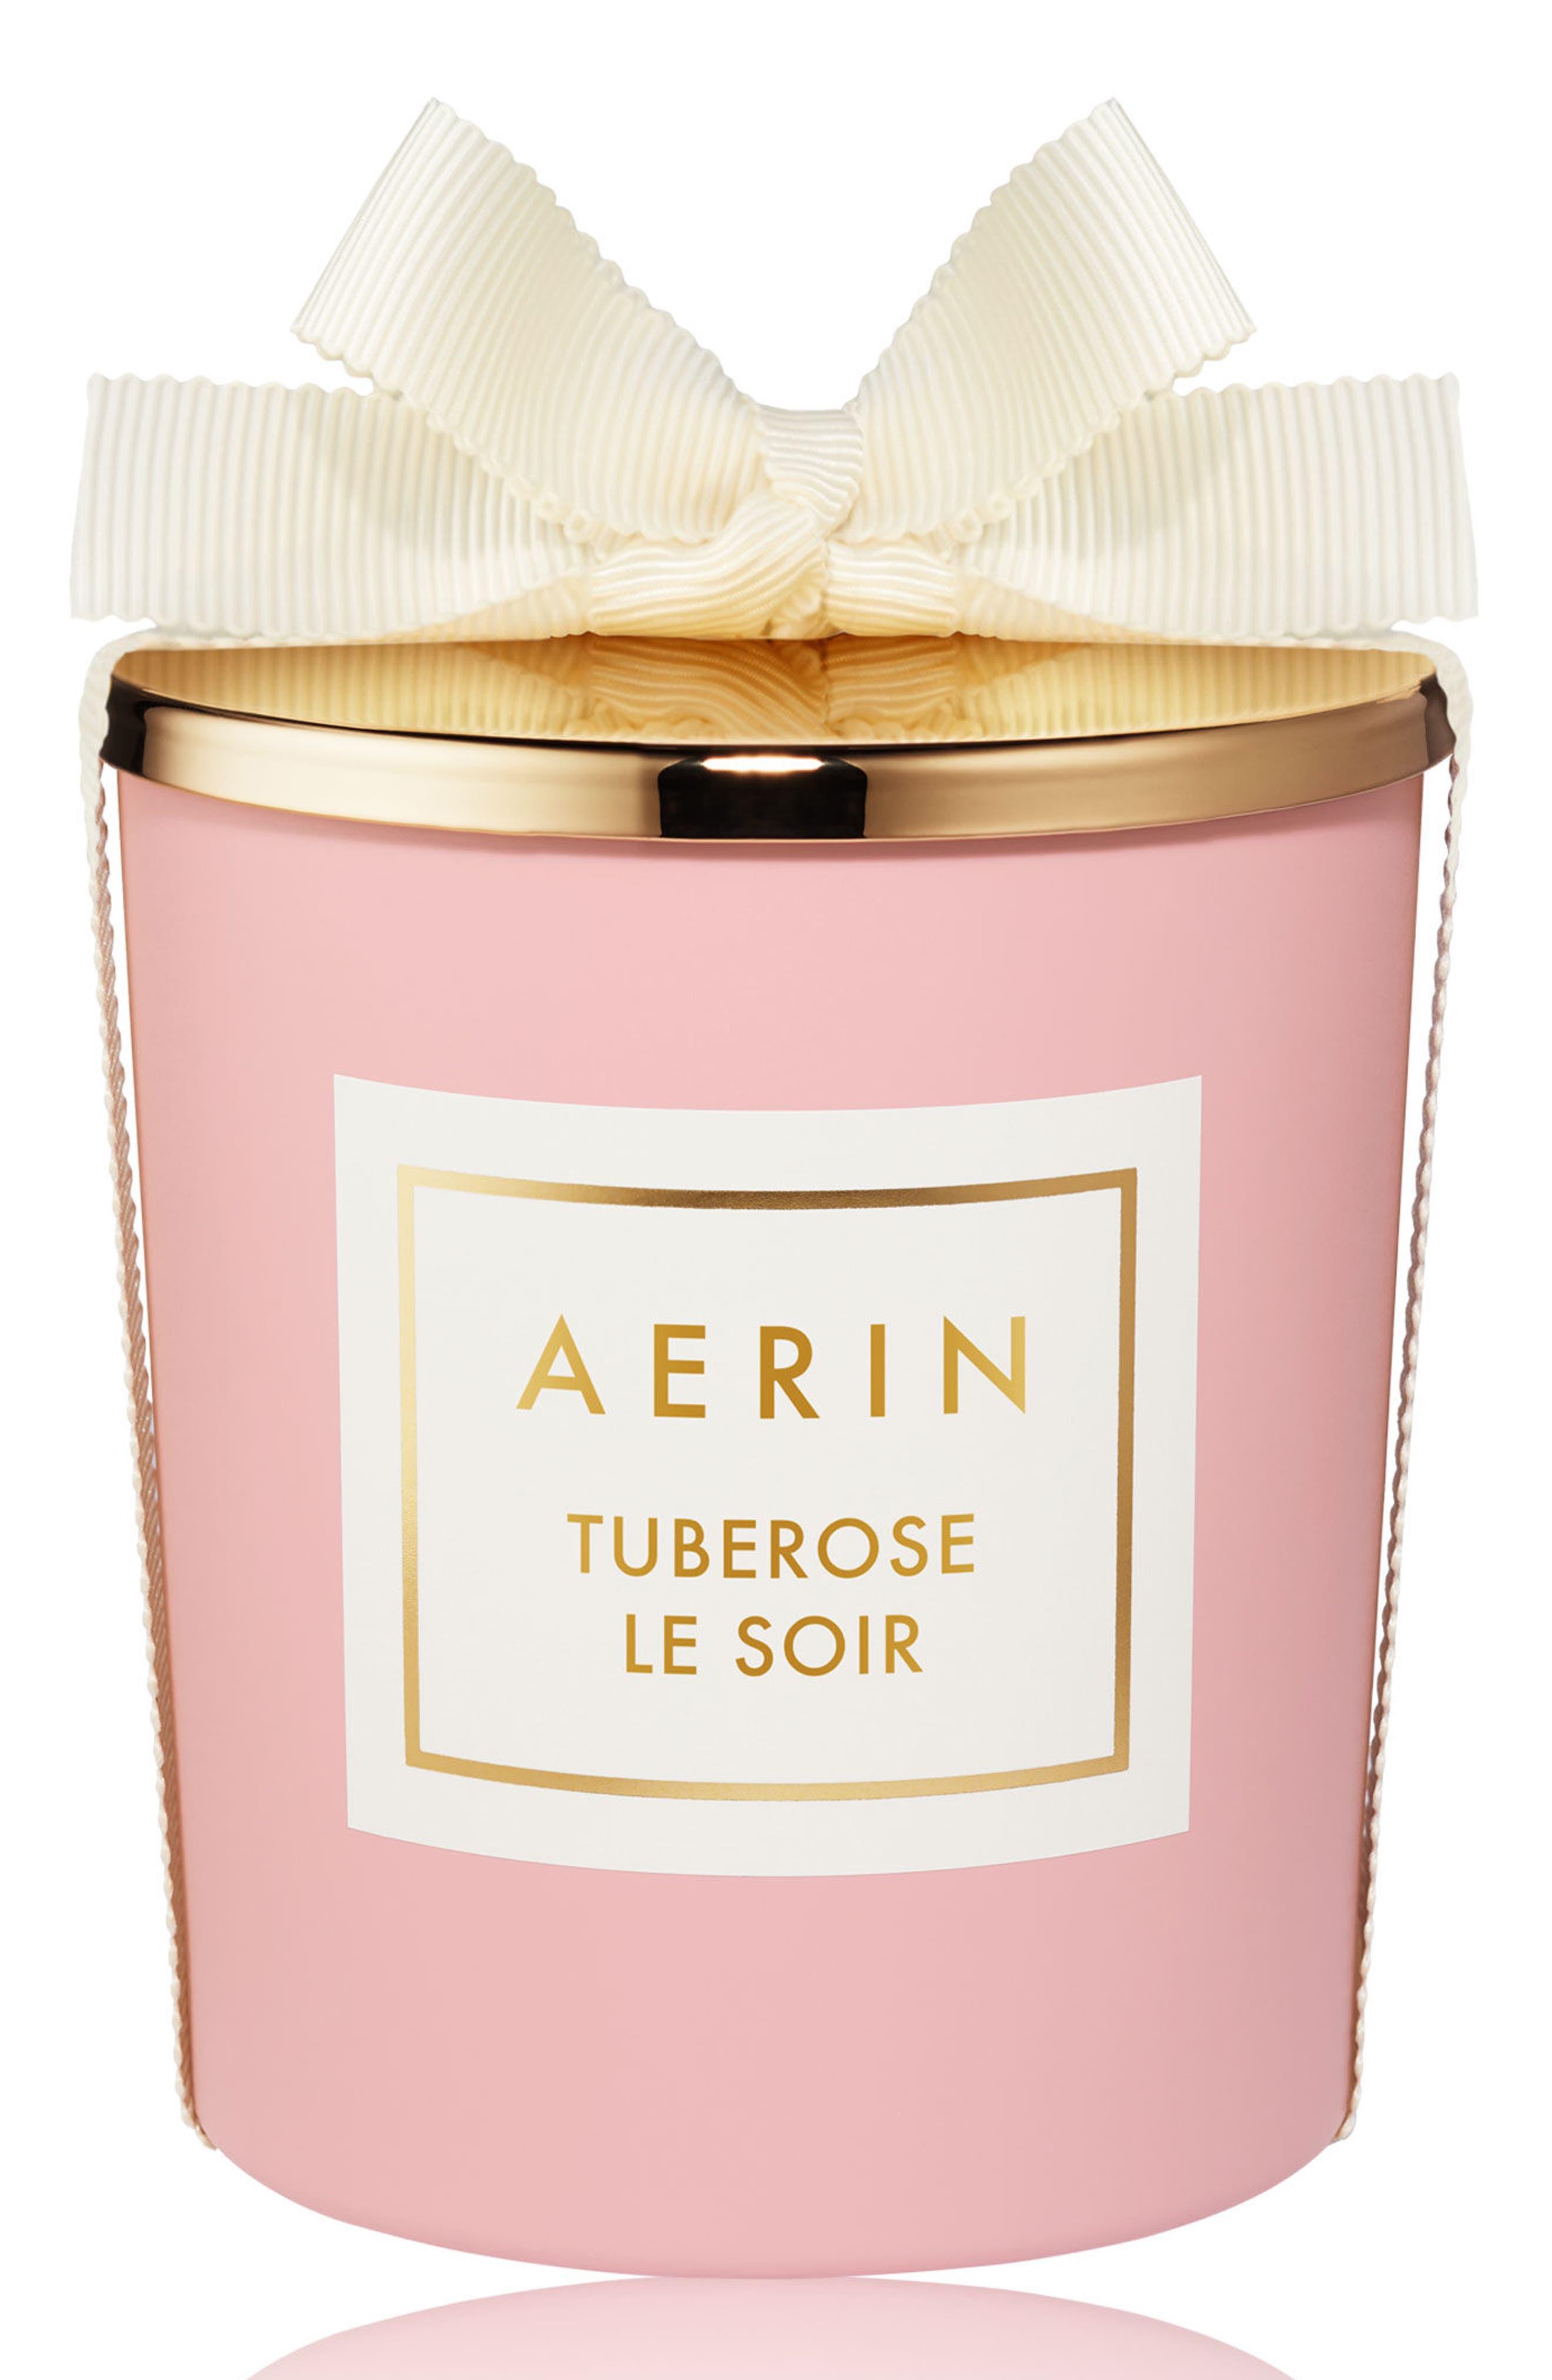 AERIN Beauty Tuberose Le Soir Candle,                         Main,                         color, No Color